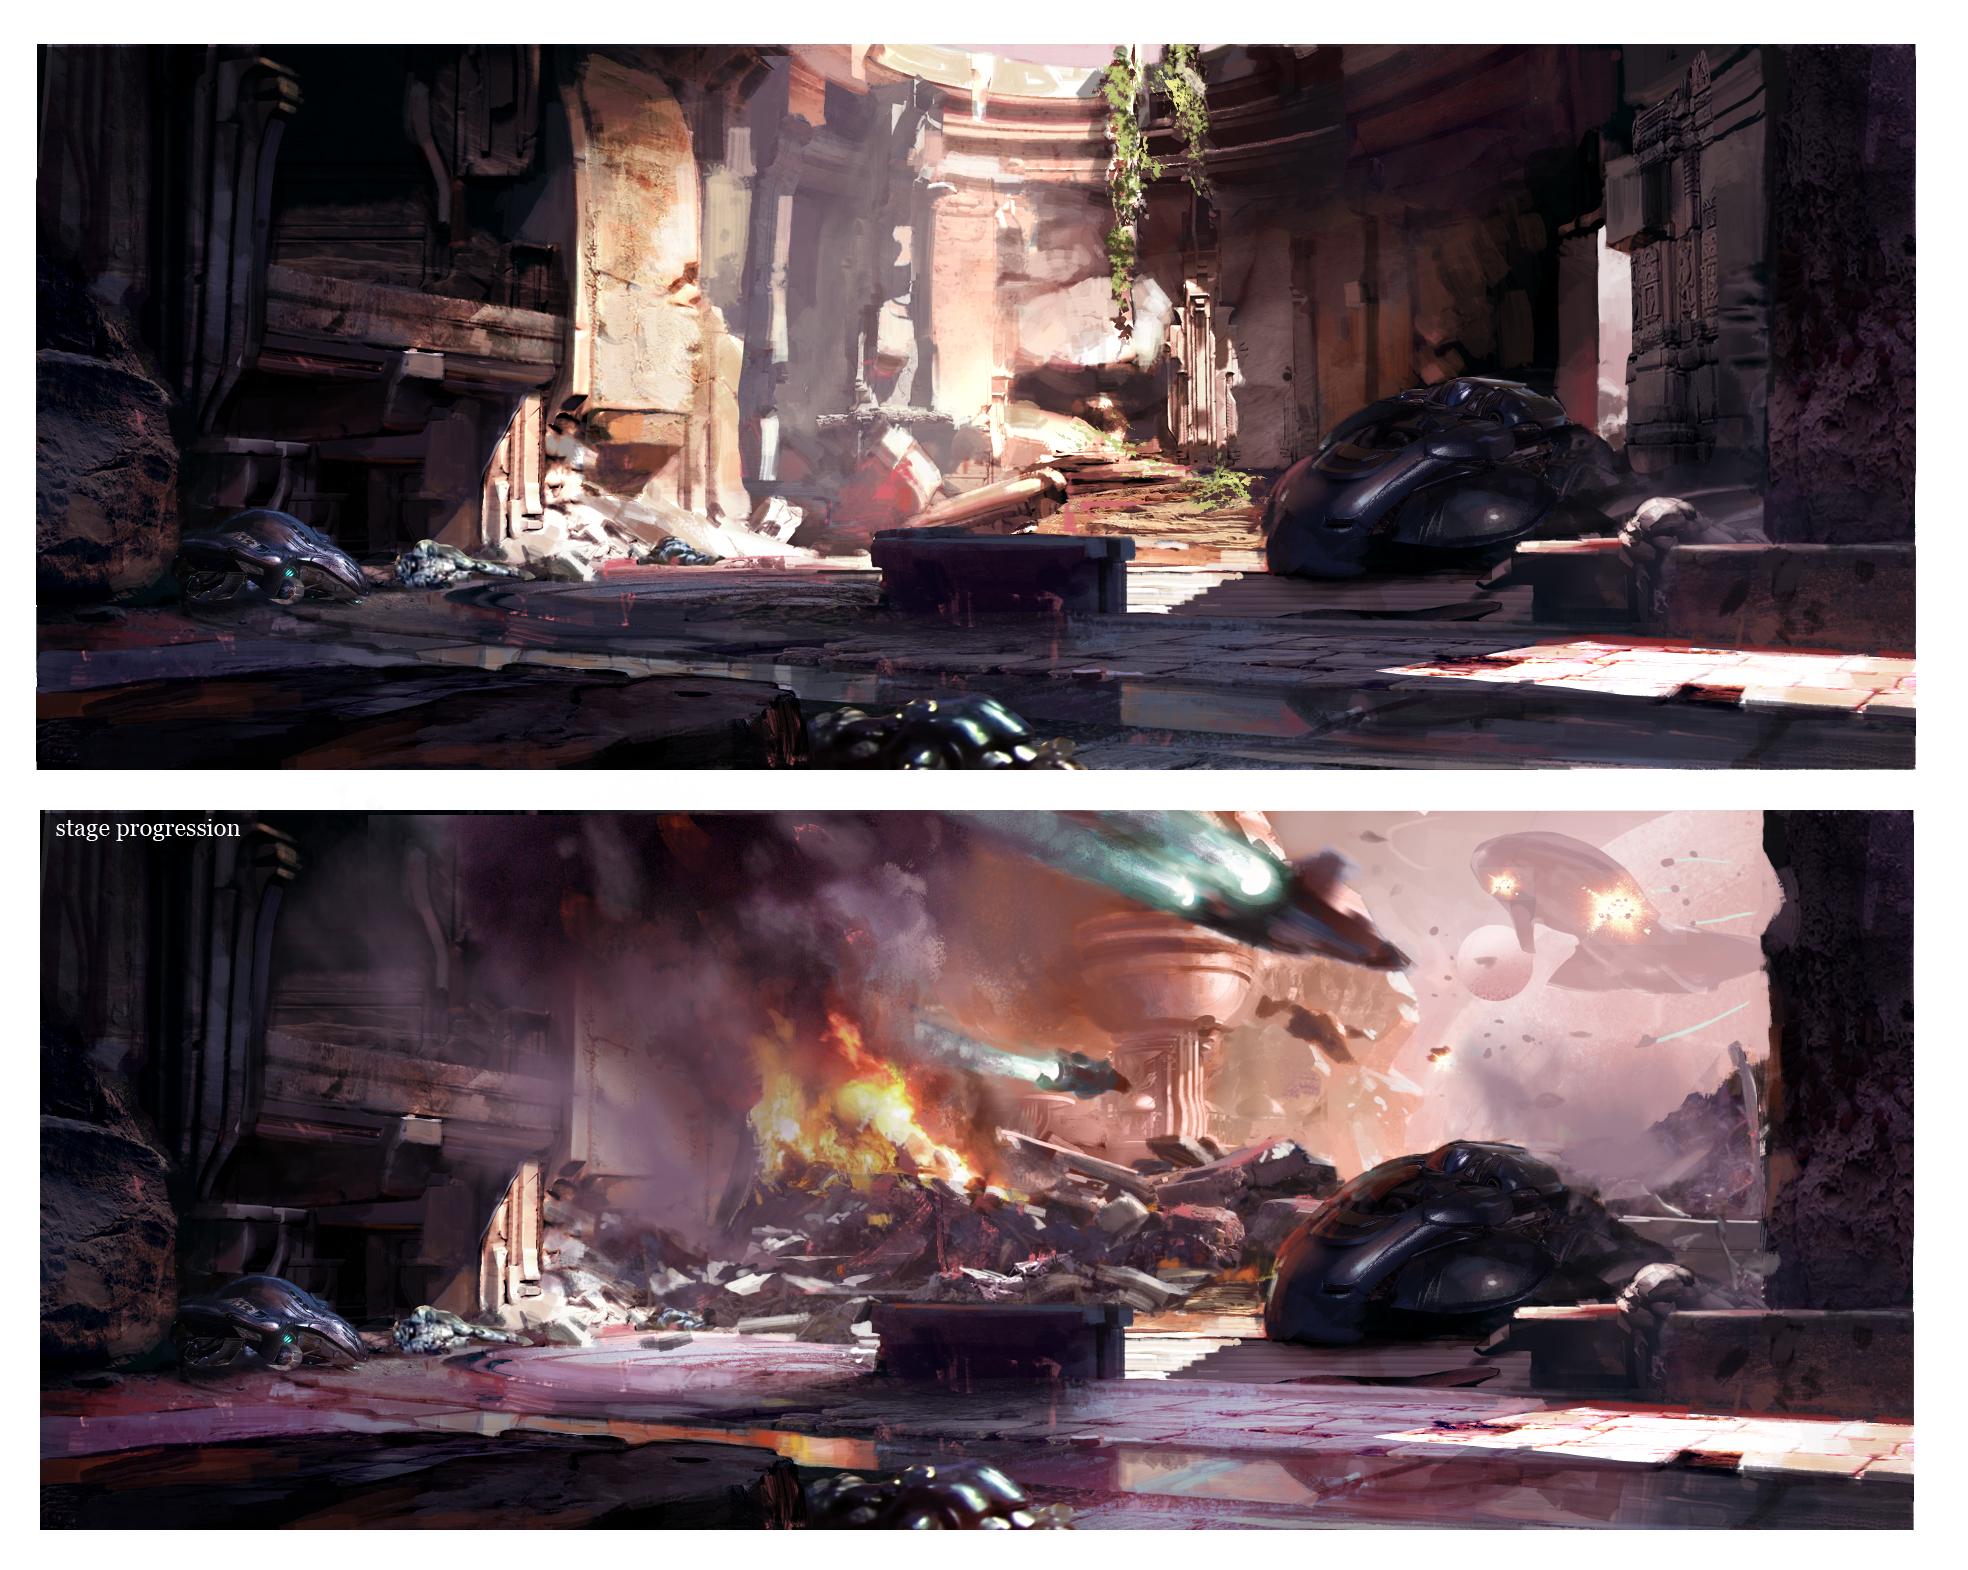 Killer Instinct Aribiter stage concept art, via 343 Industries